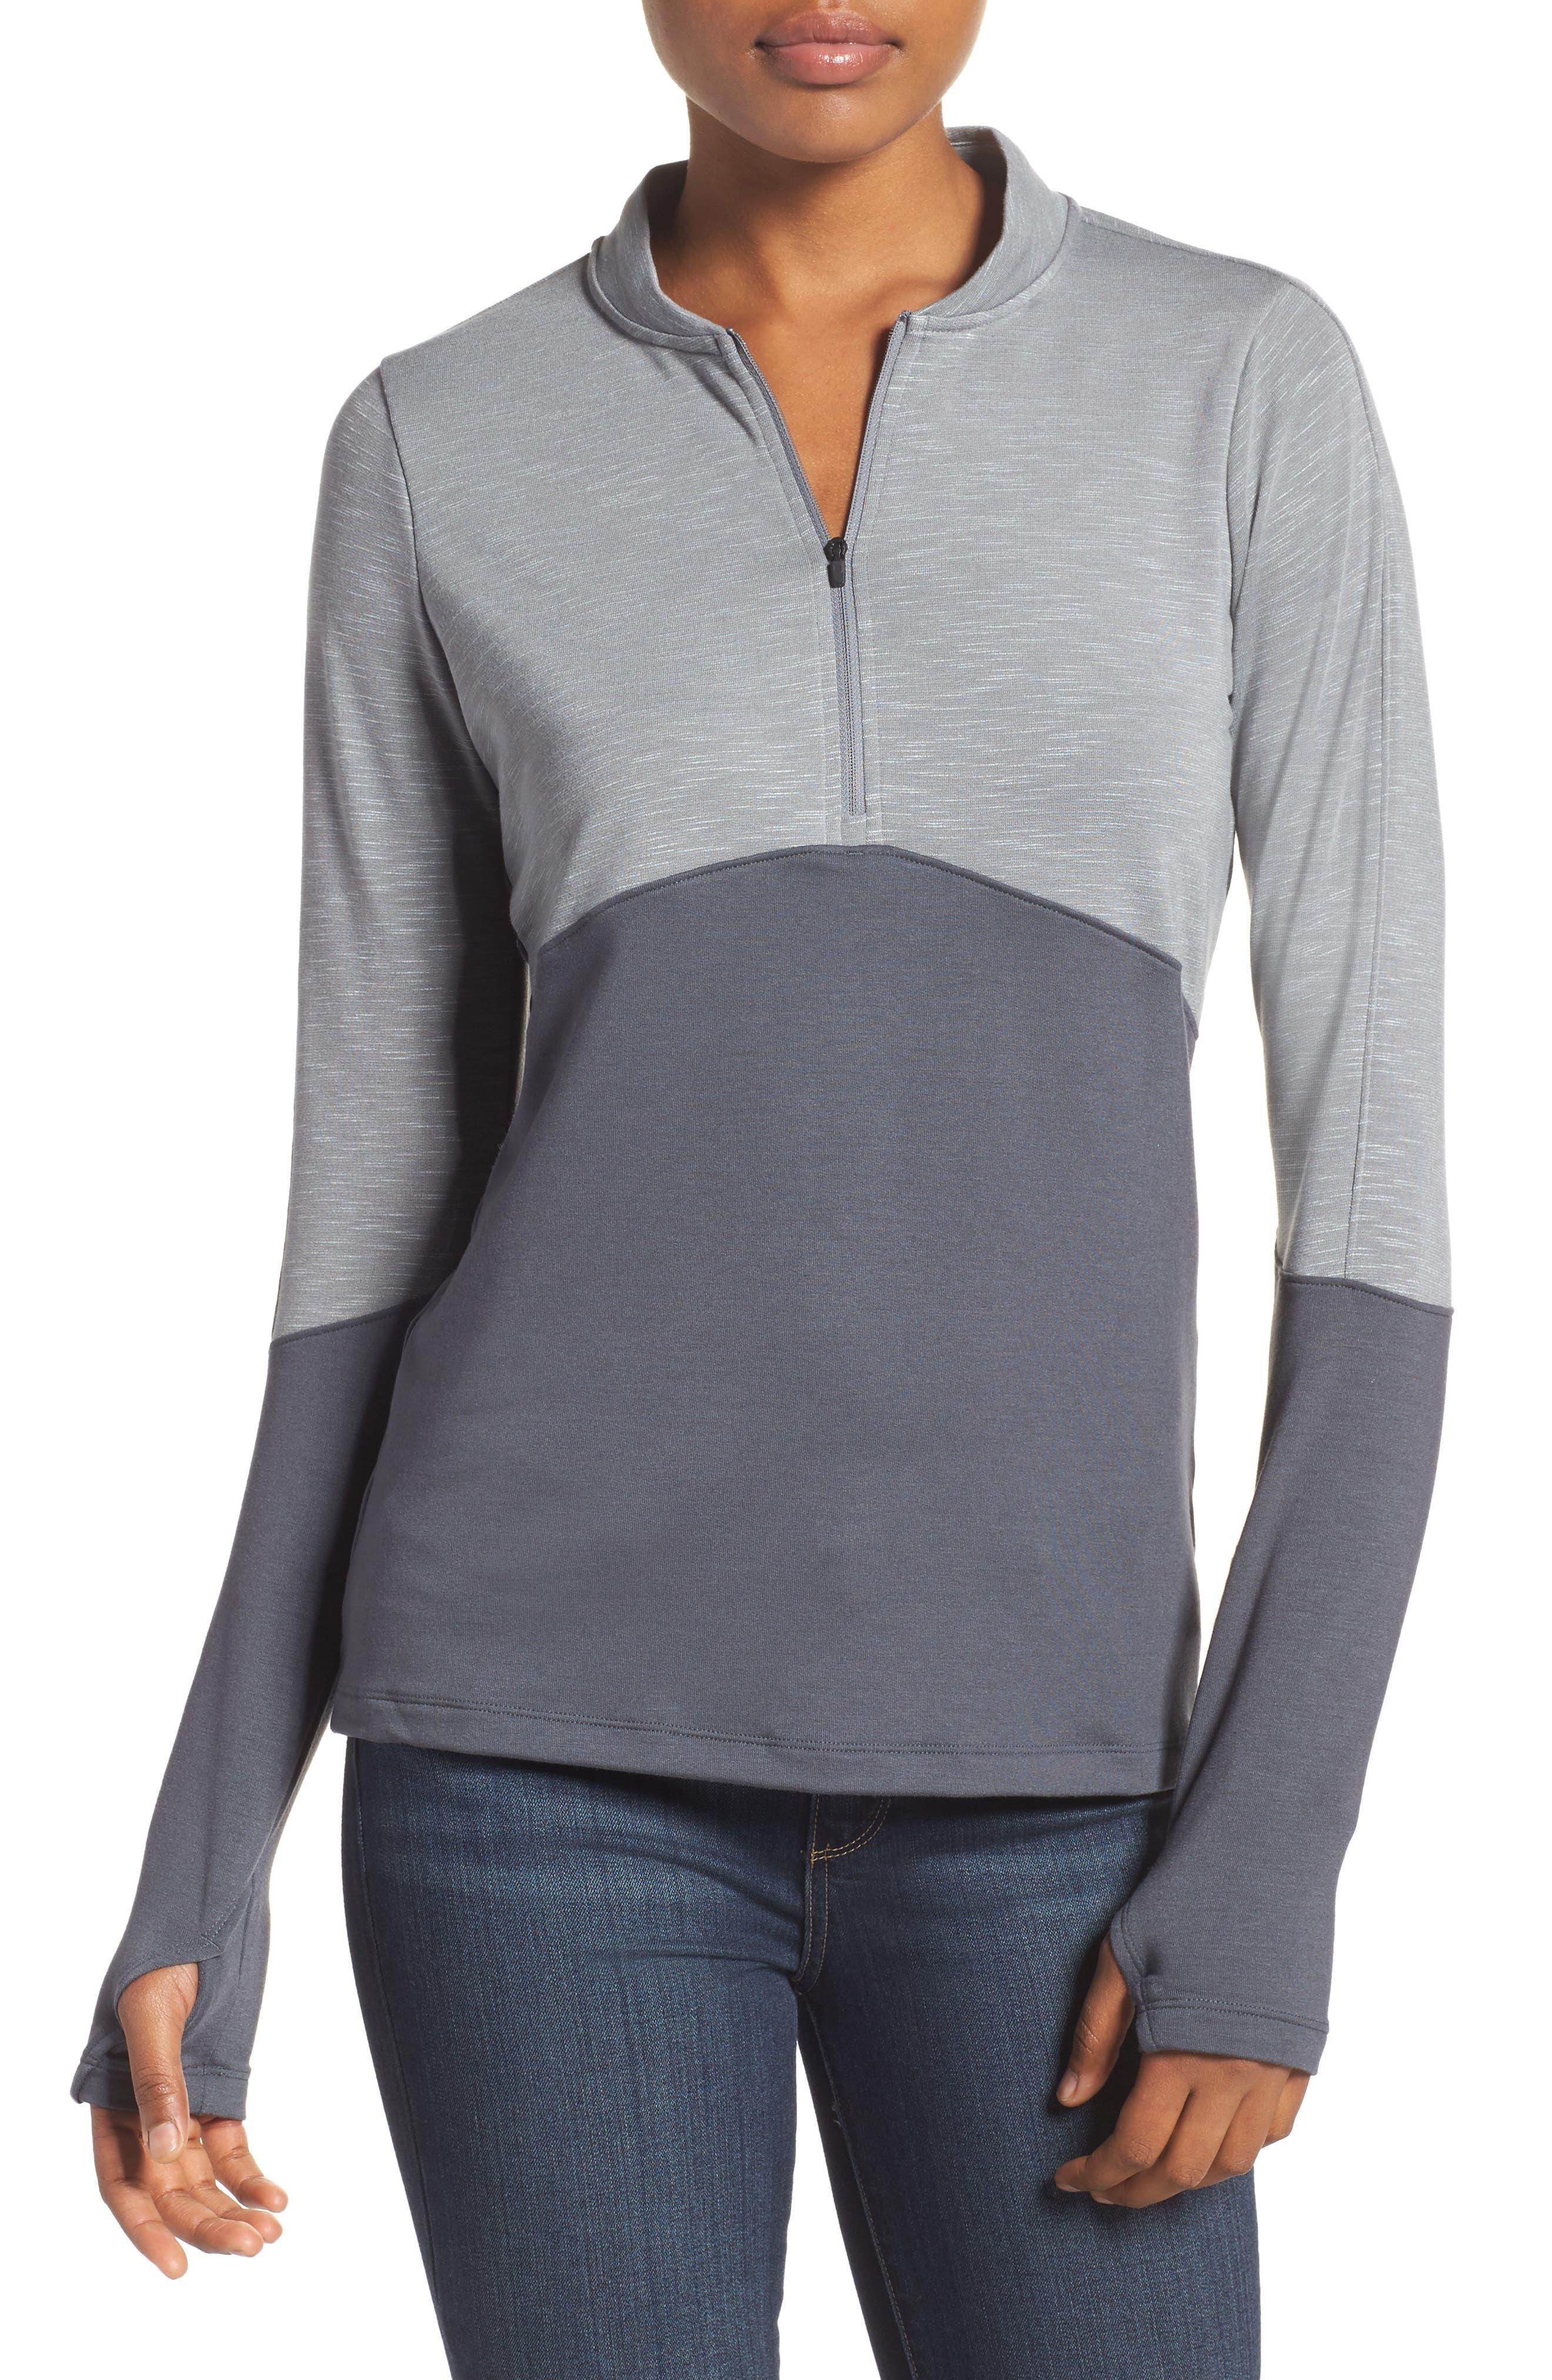 Threadborne Pullover,                         Main,                         color,